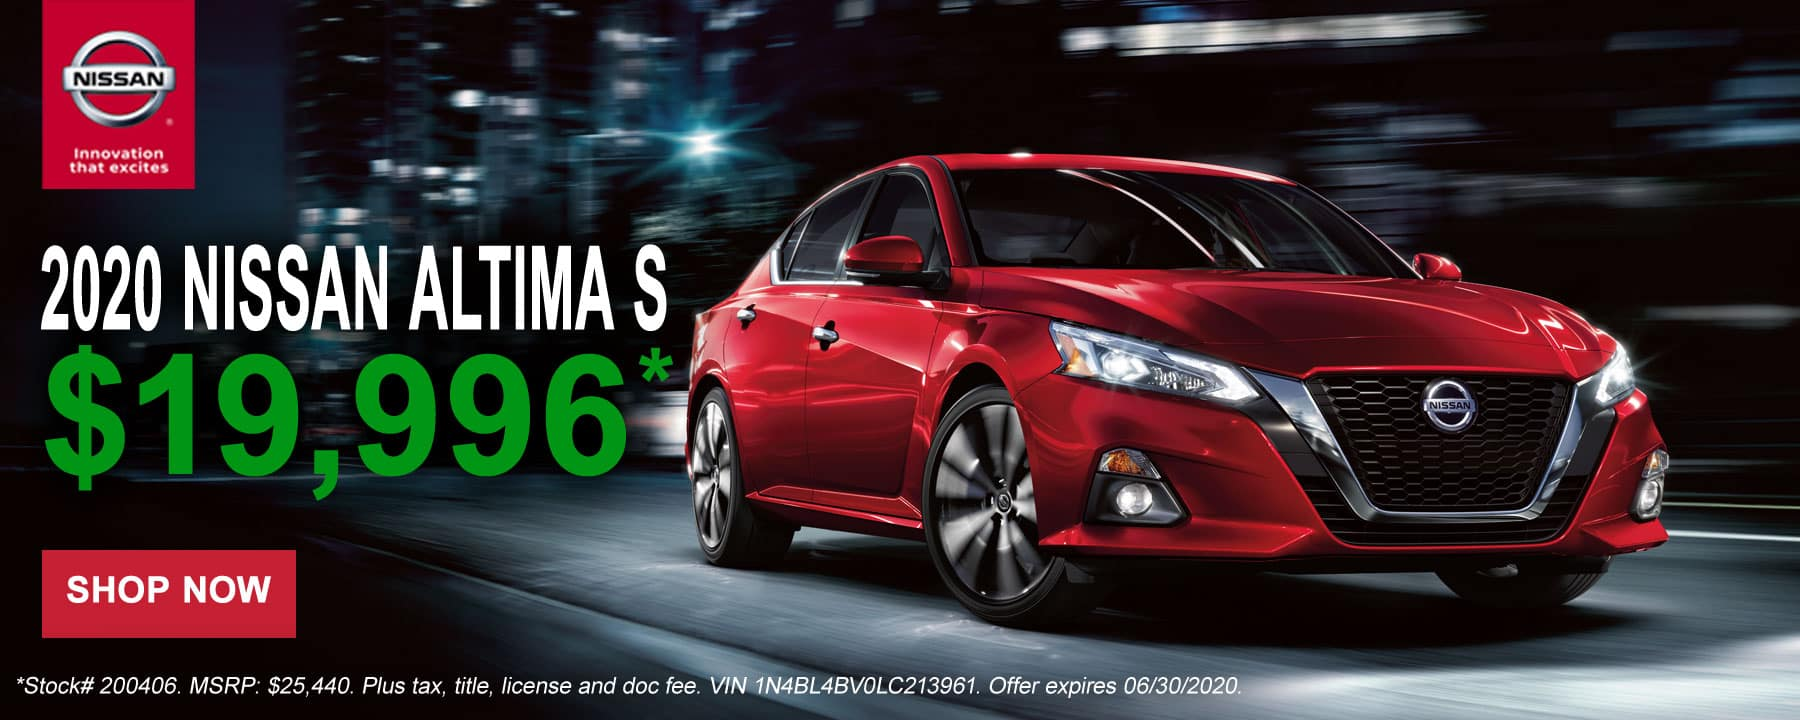 2020 Nissan Altima June Offer at Star Nissan